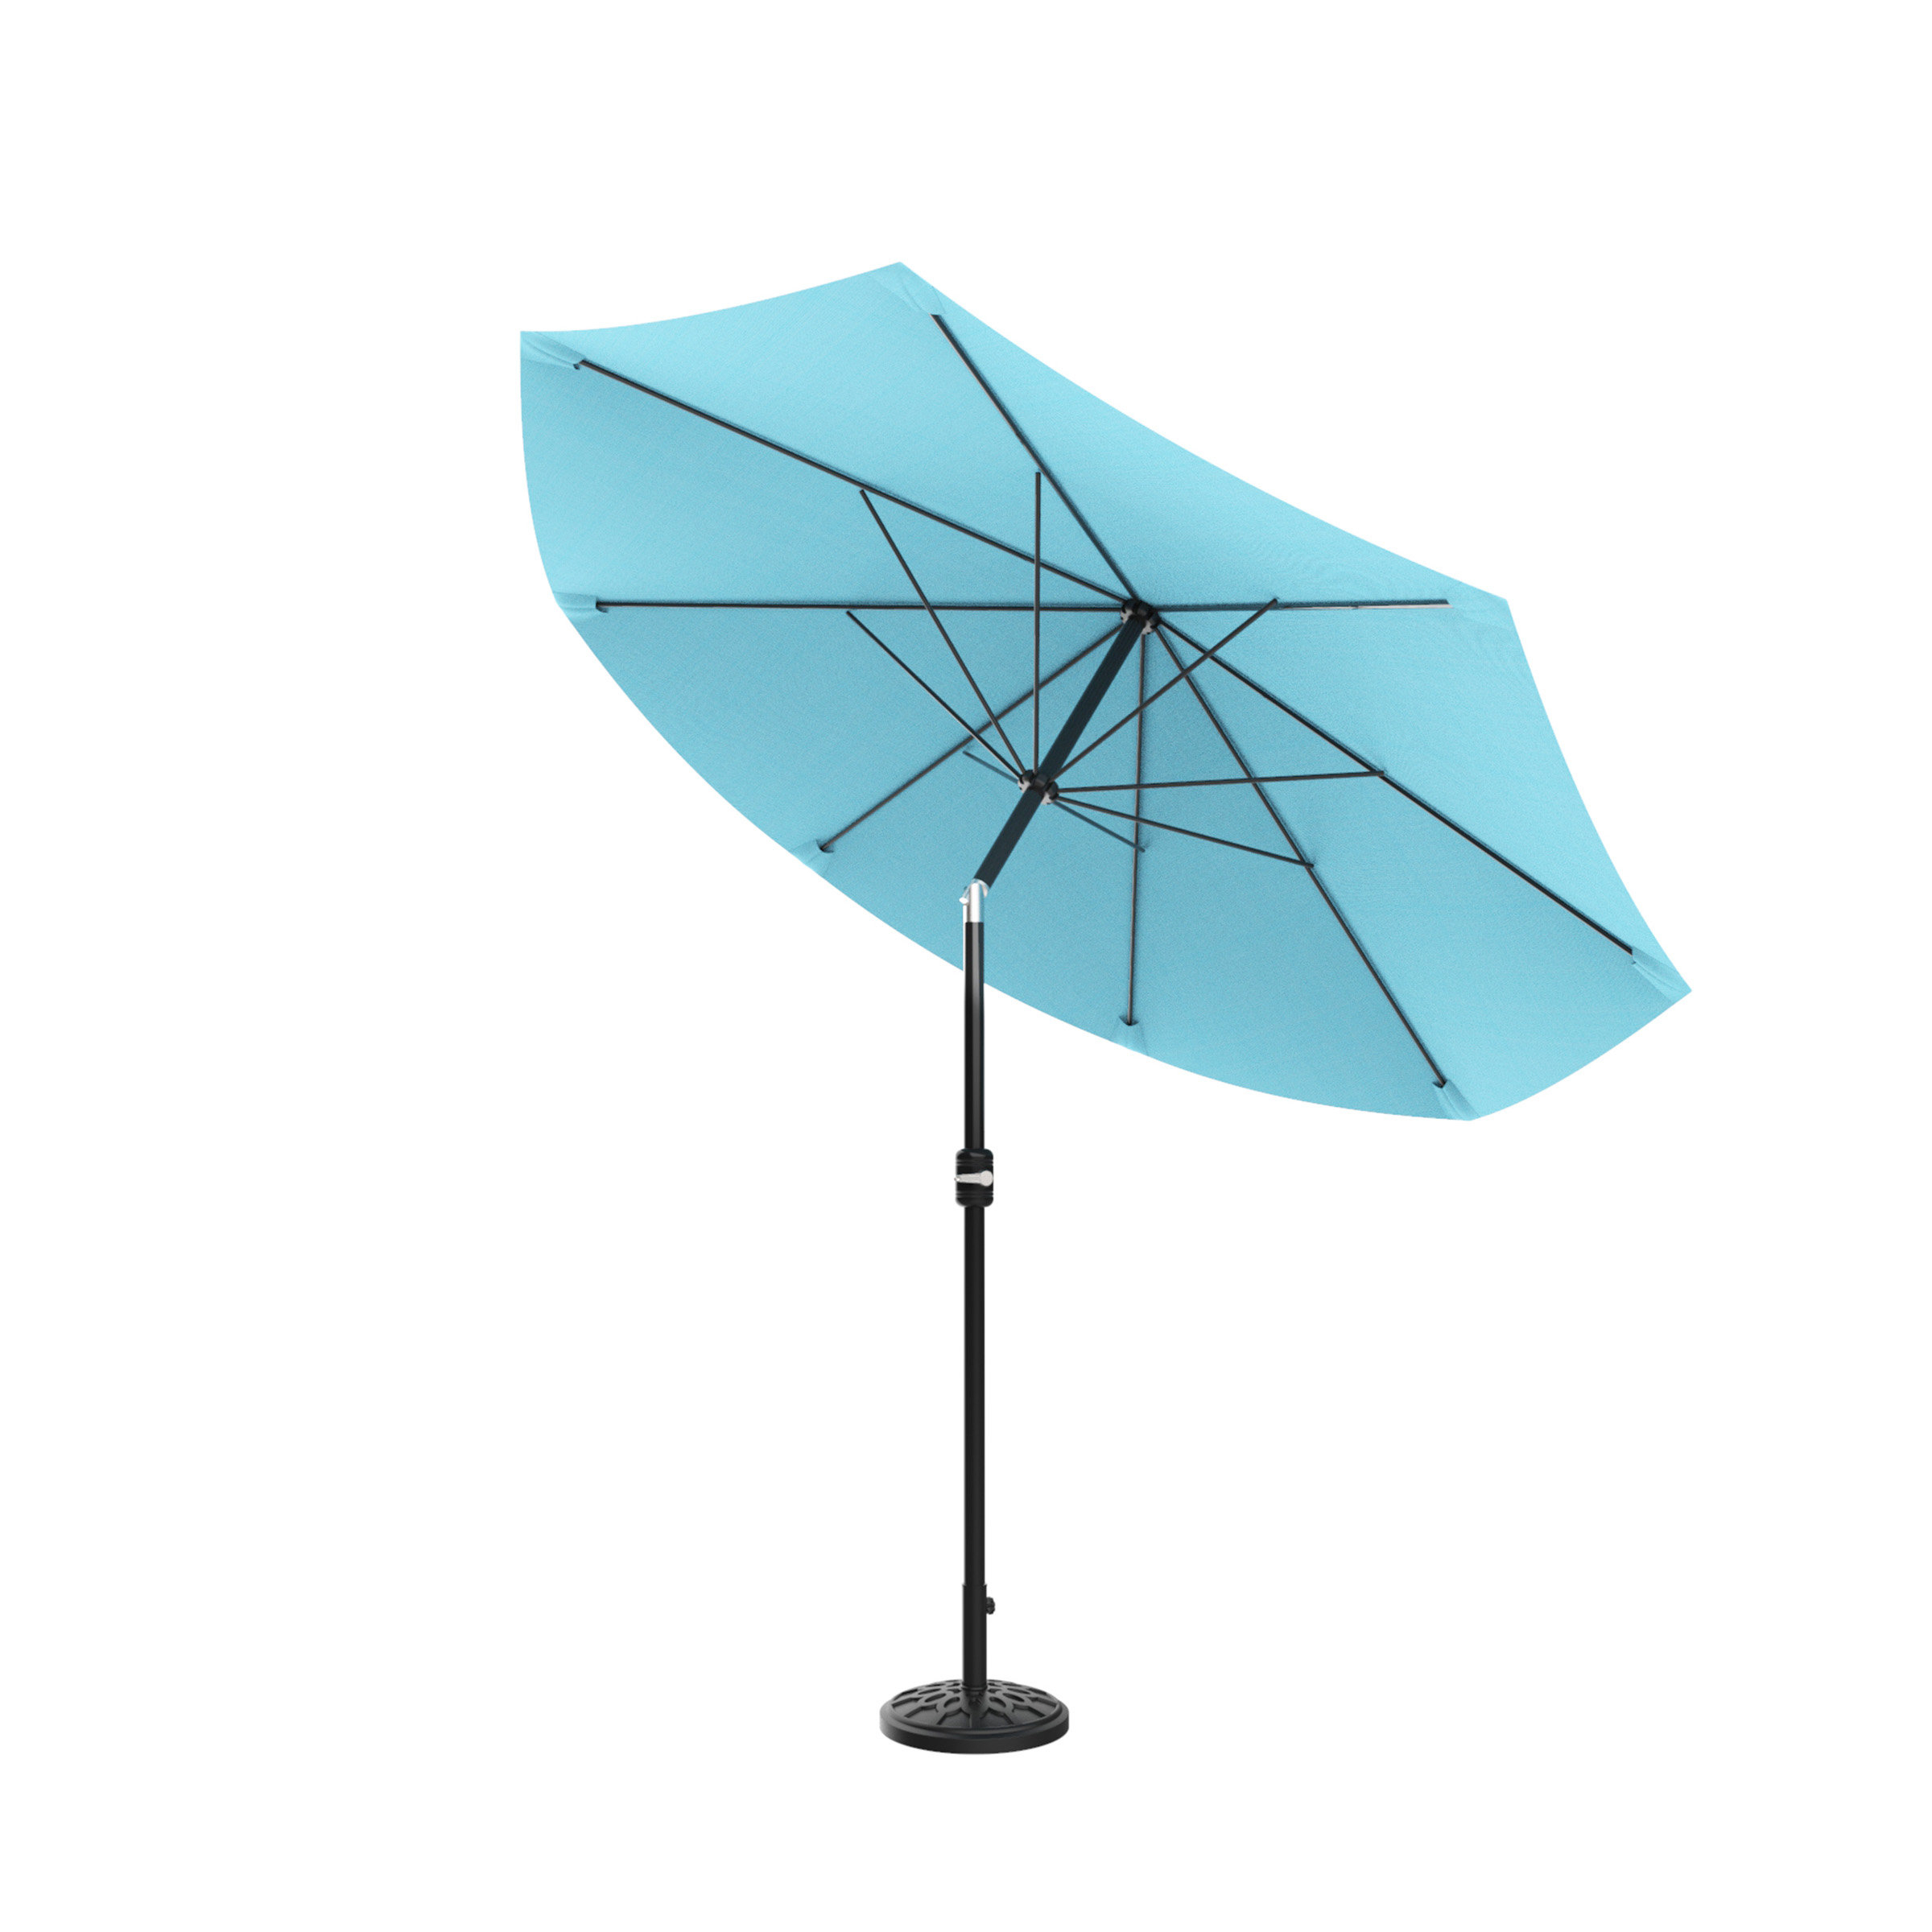 Most Popular Kelton 10' Market Umbrella Pertaining To Kearney Market Umbrellas (View 6 of 20)